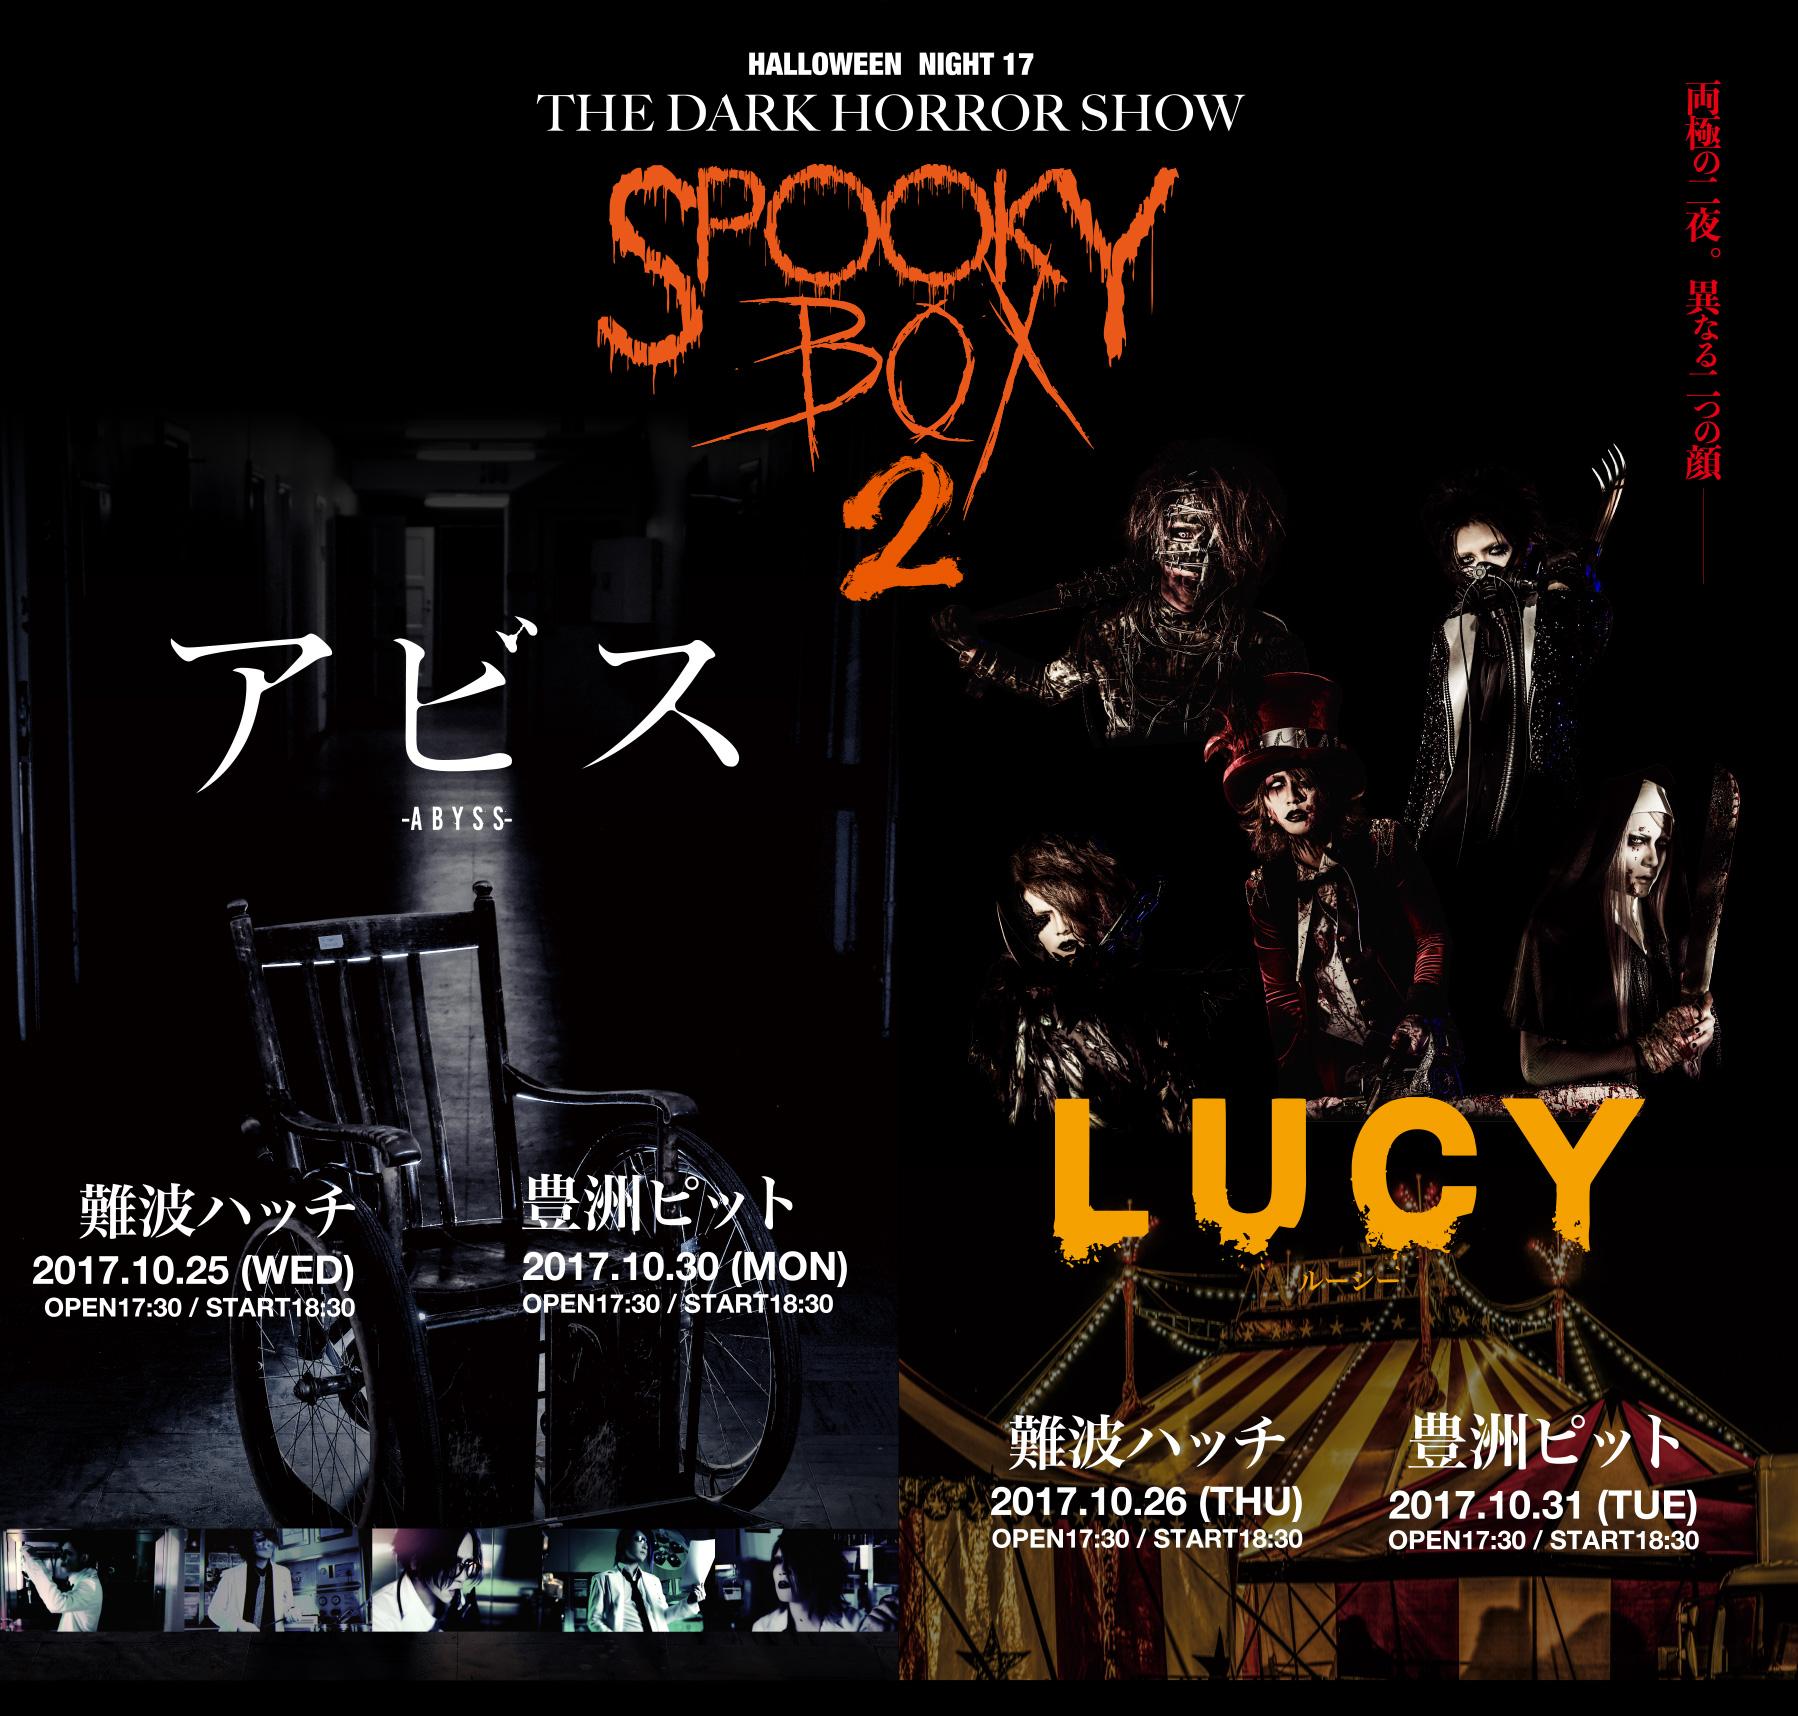 Halloween Night 17 The Dark Horror Show Spooky Box2 The Gazette